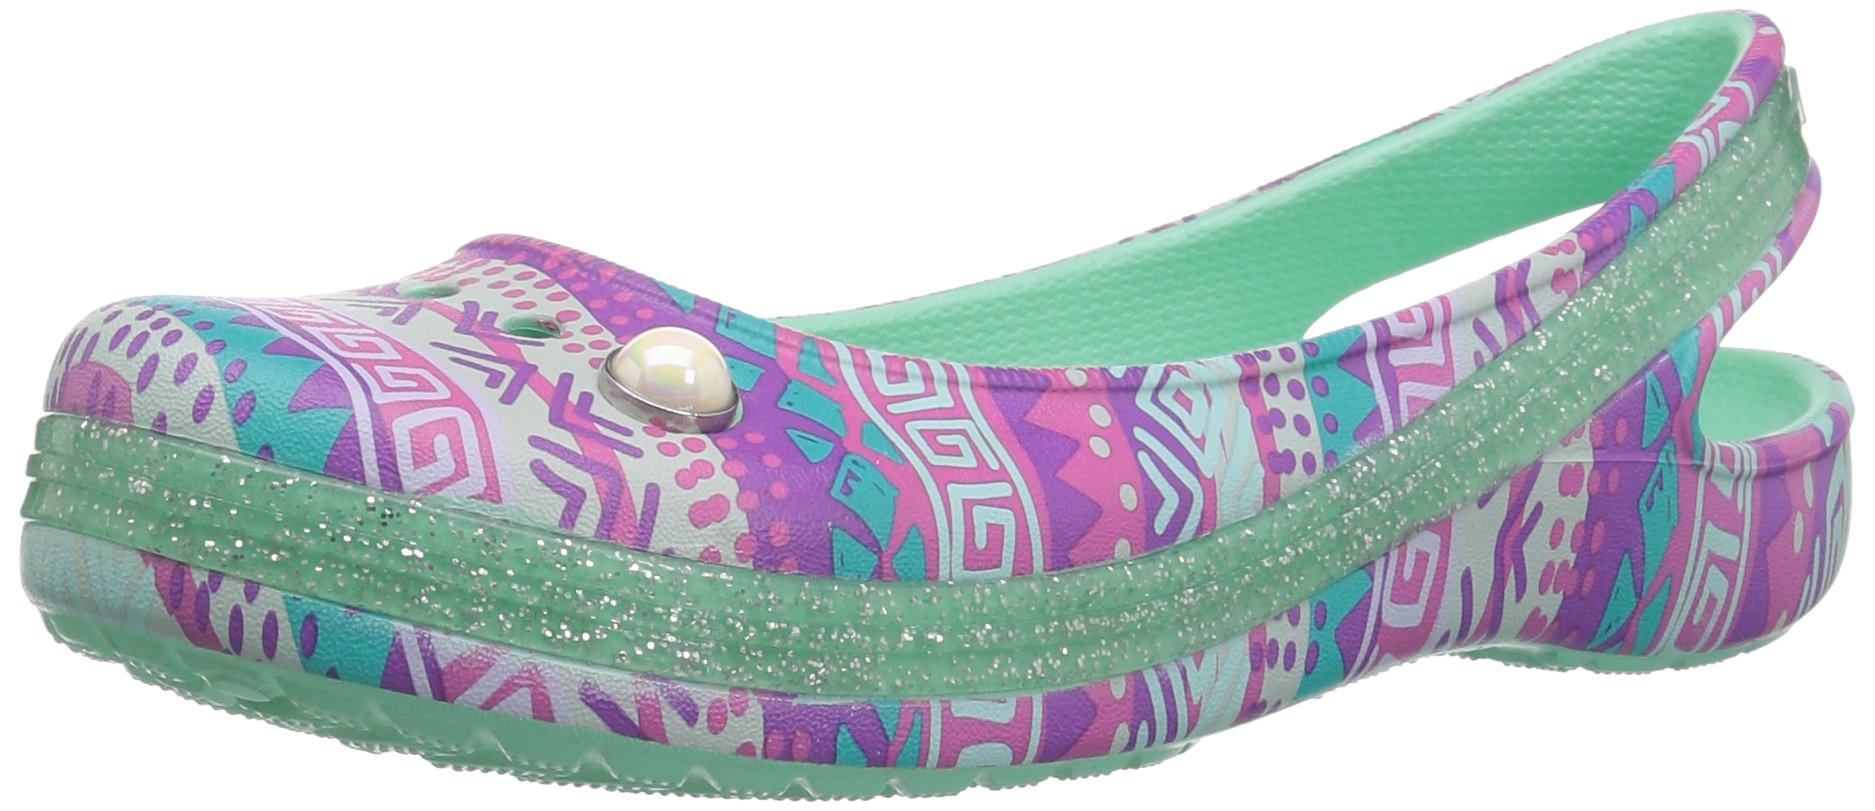 Crocs Girls' Genna II Graph Sparkle Sling K Ballet Flat, Mint, 10 M US Little Kid